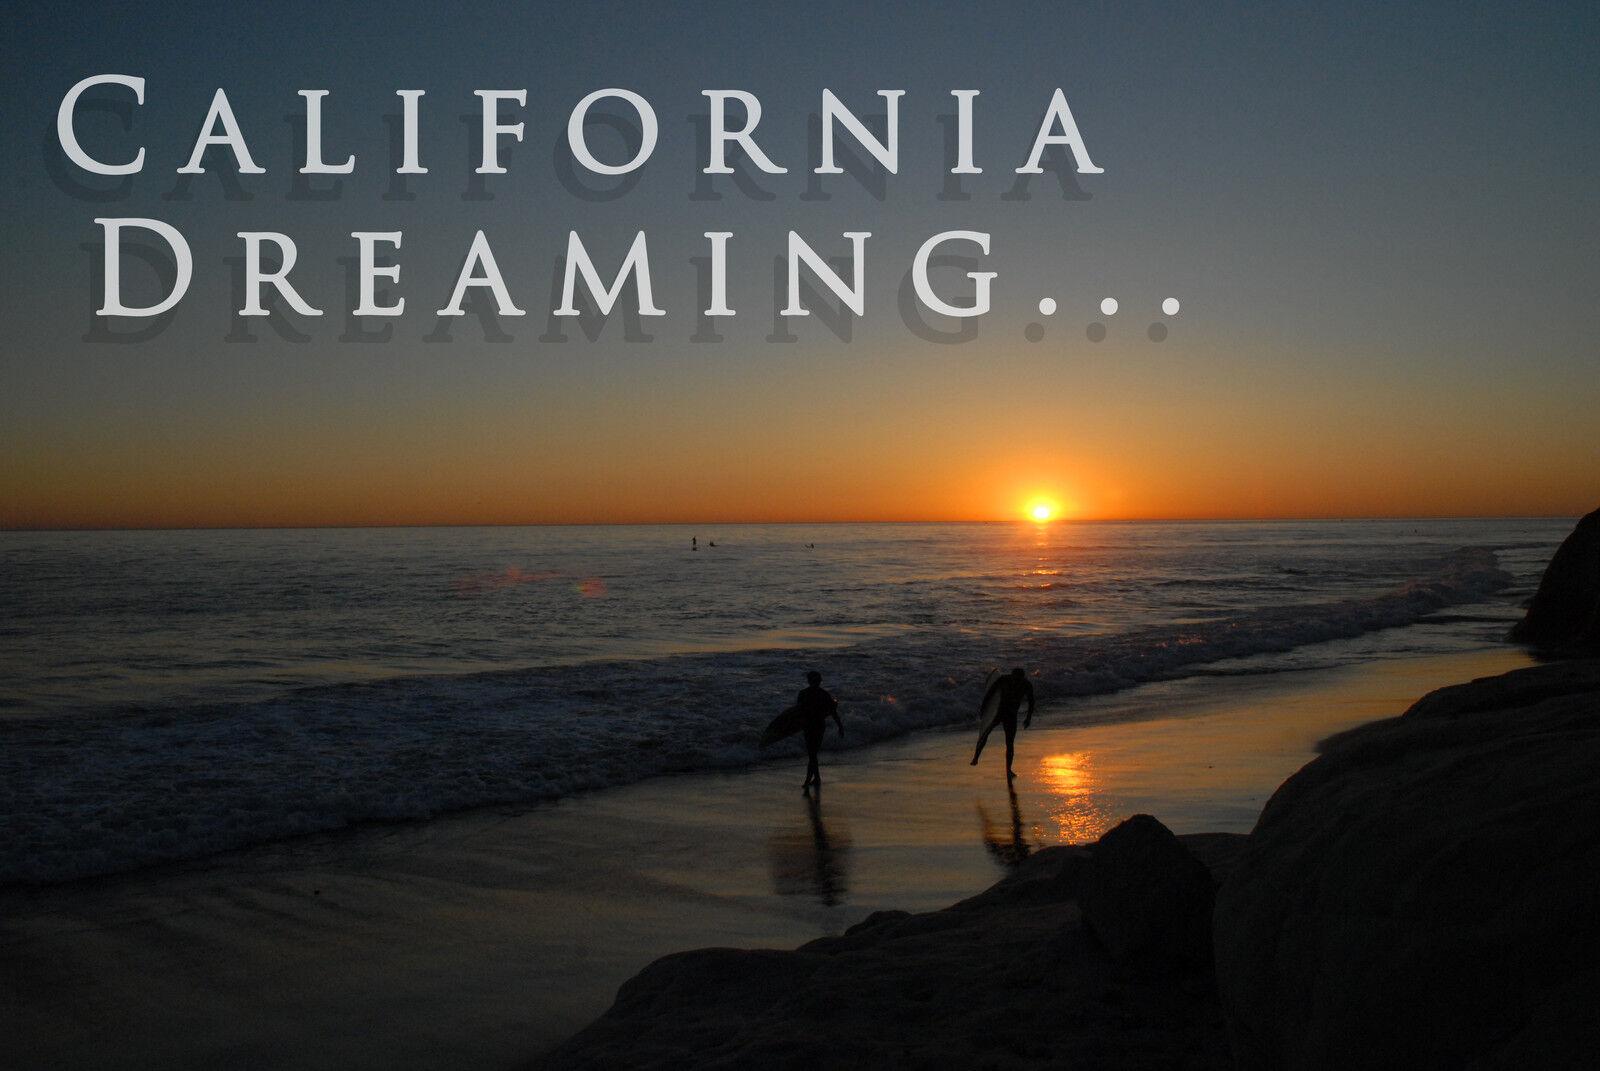 californiadreaminguk